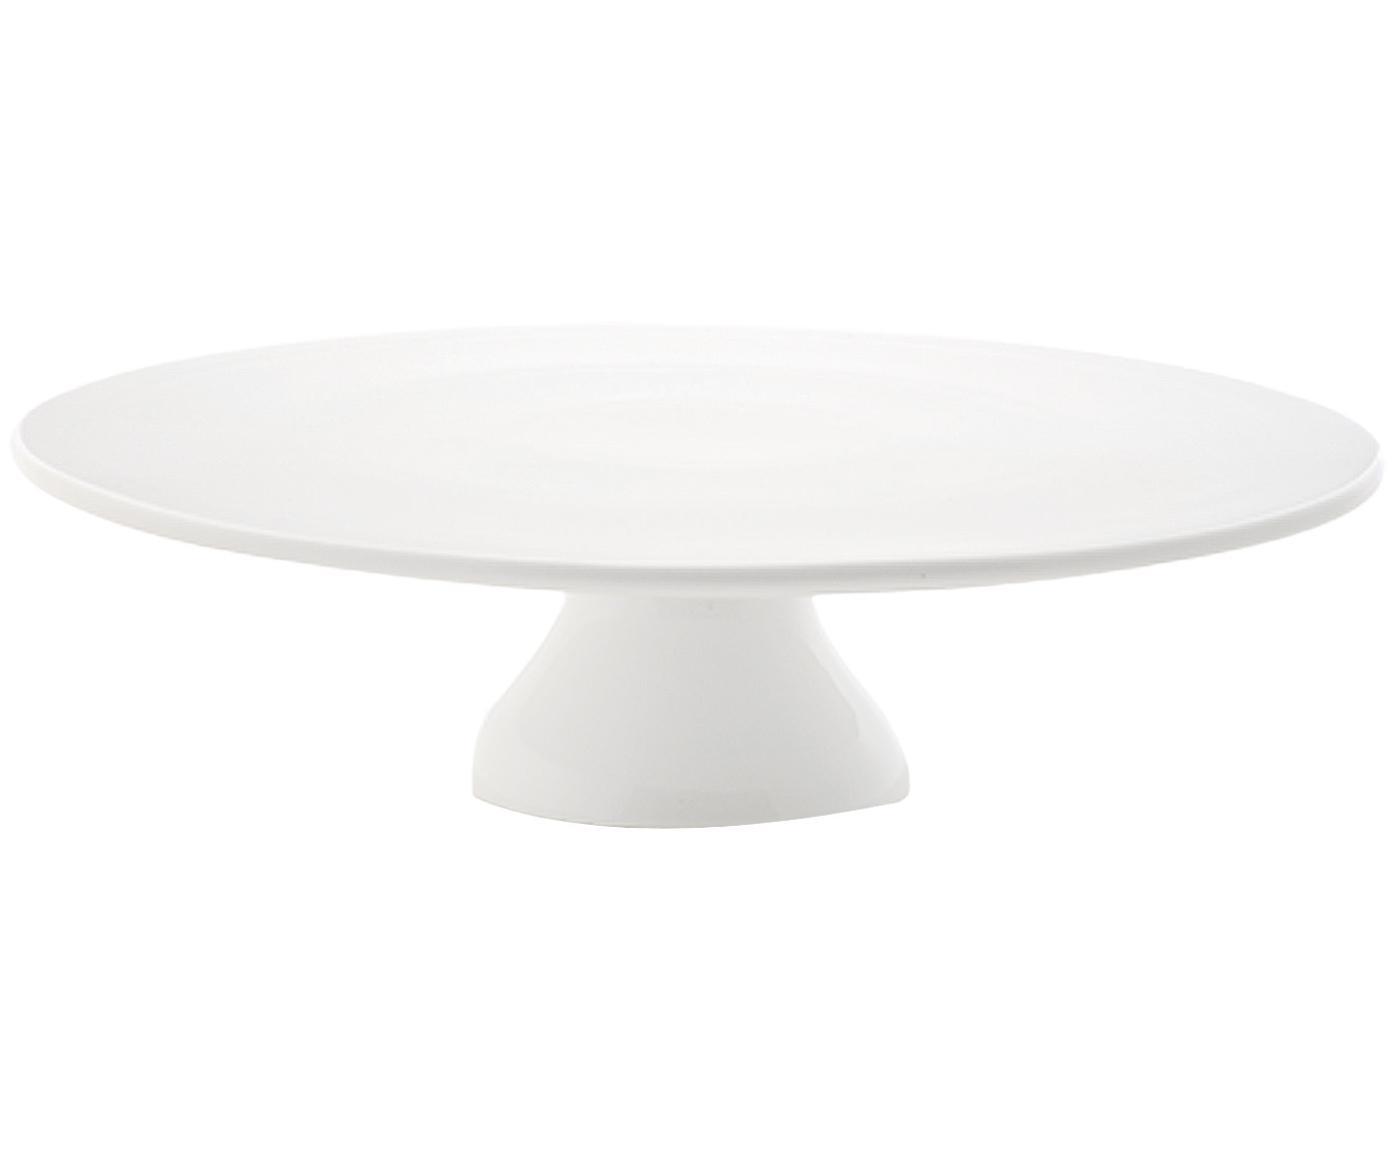 Patera na tort Yanis, Porcelana, Biały, Ø 33 cm